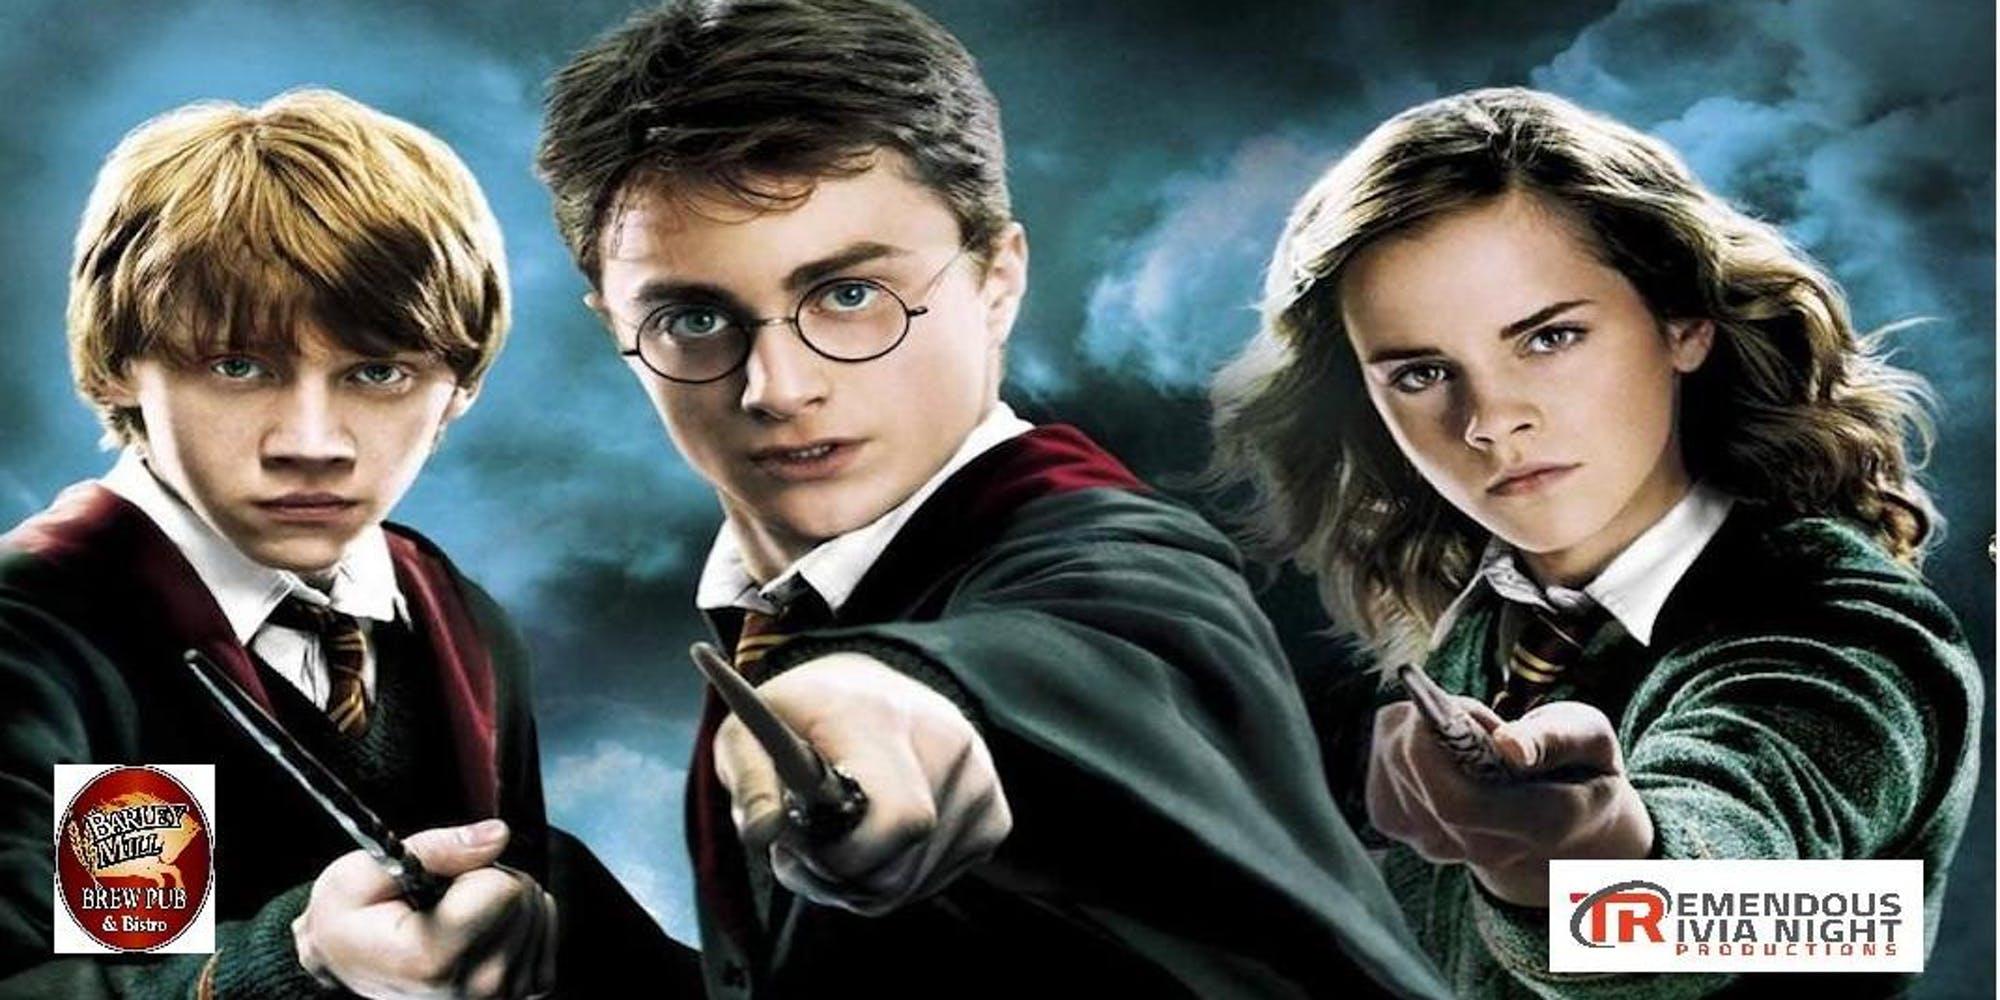 Harry potter trivia night Penticton